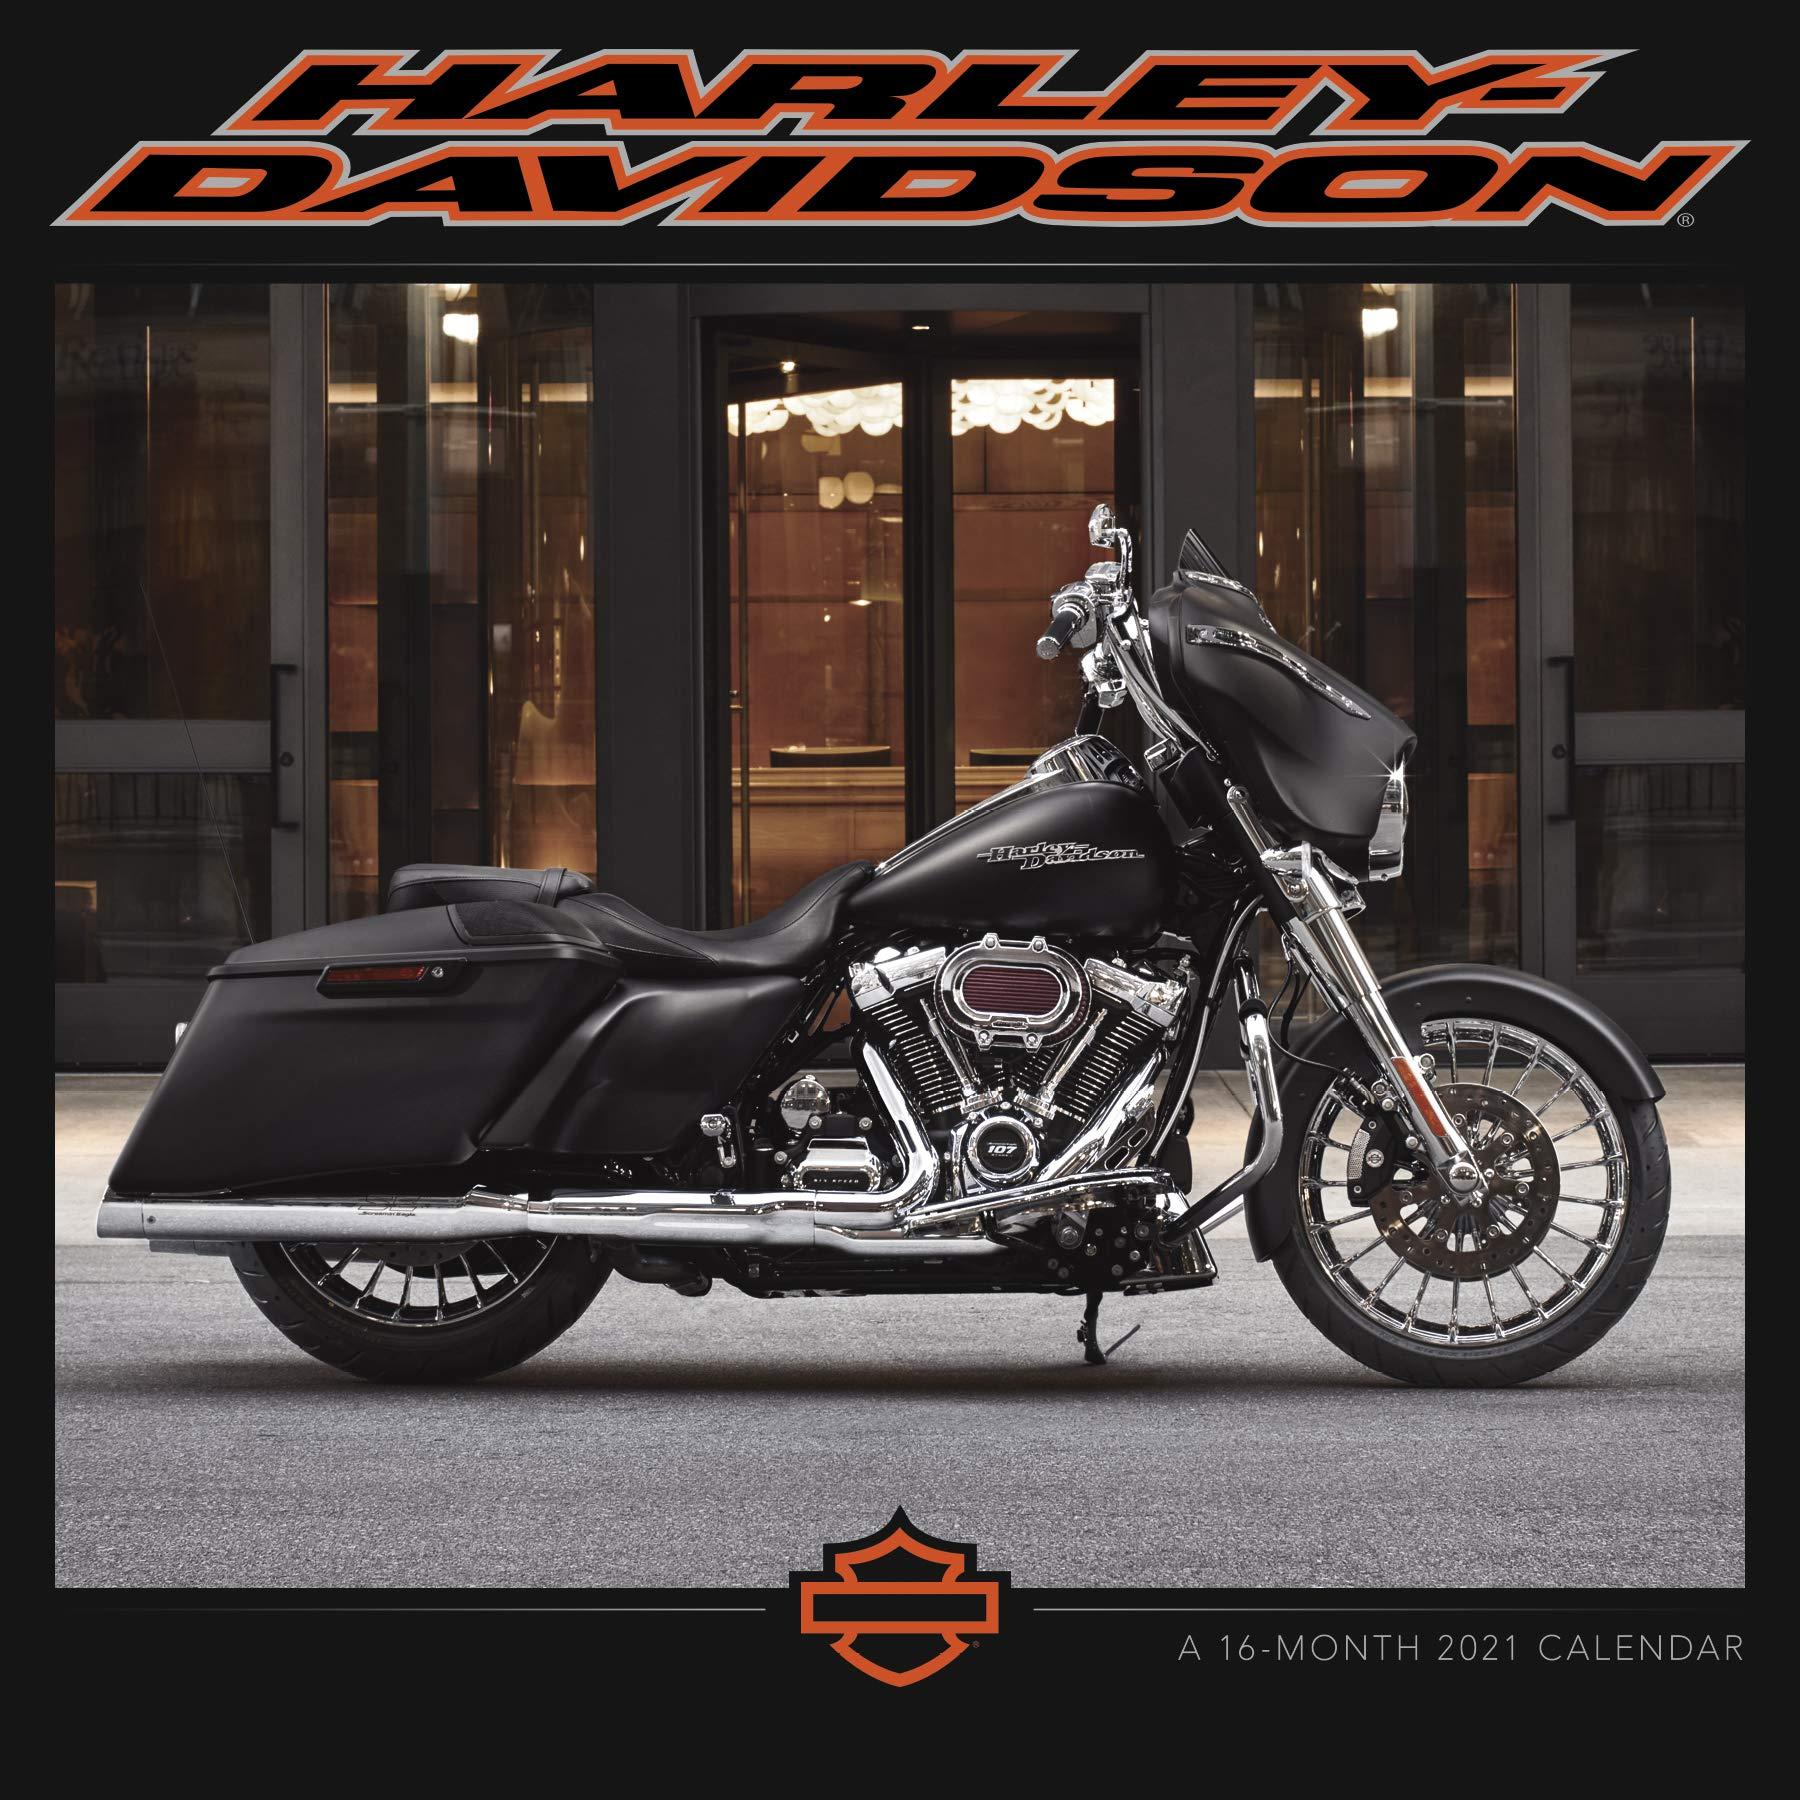 2021 Harley Davidson Wall Calendar: Trends International